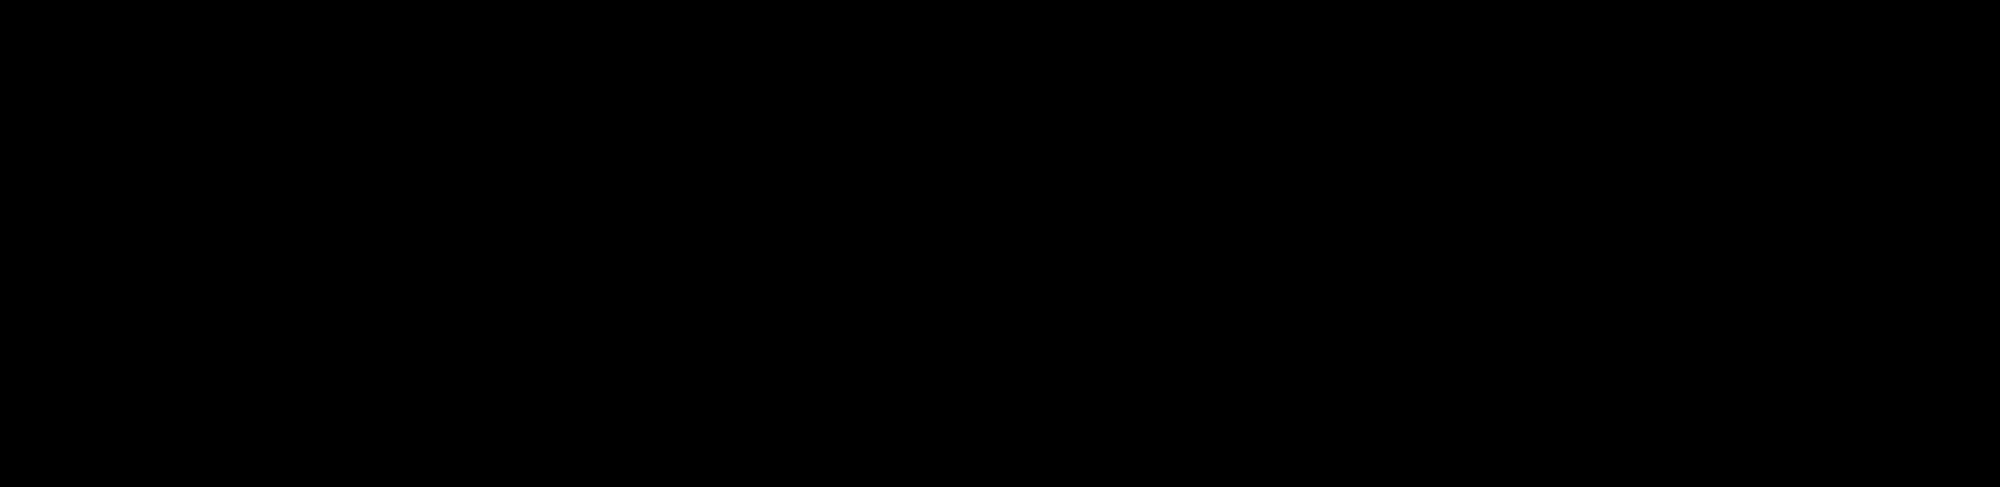 2 for couples wedding blog-logo-black.png